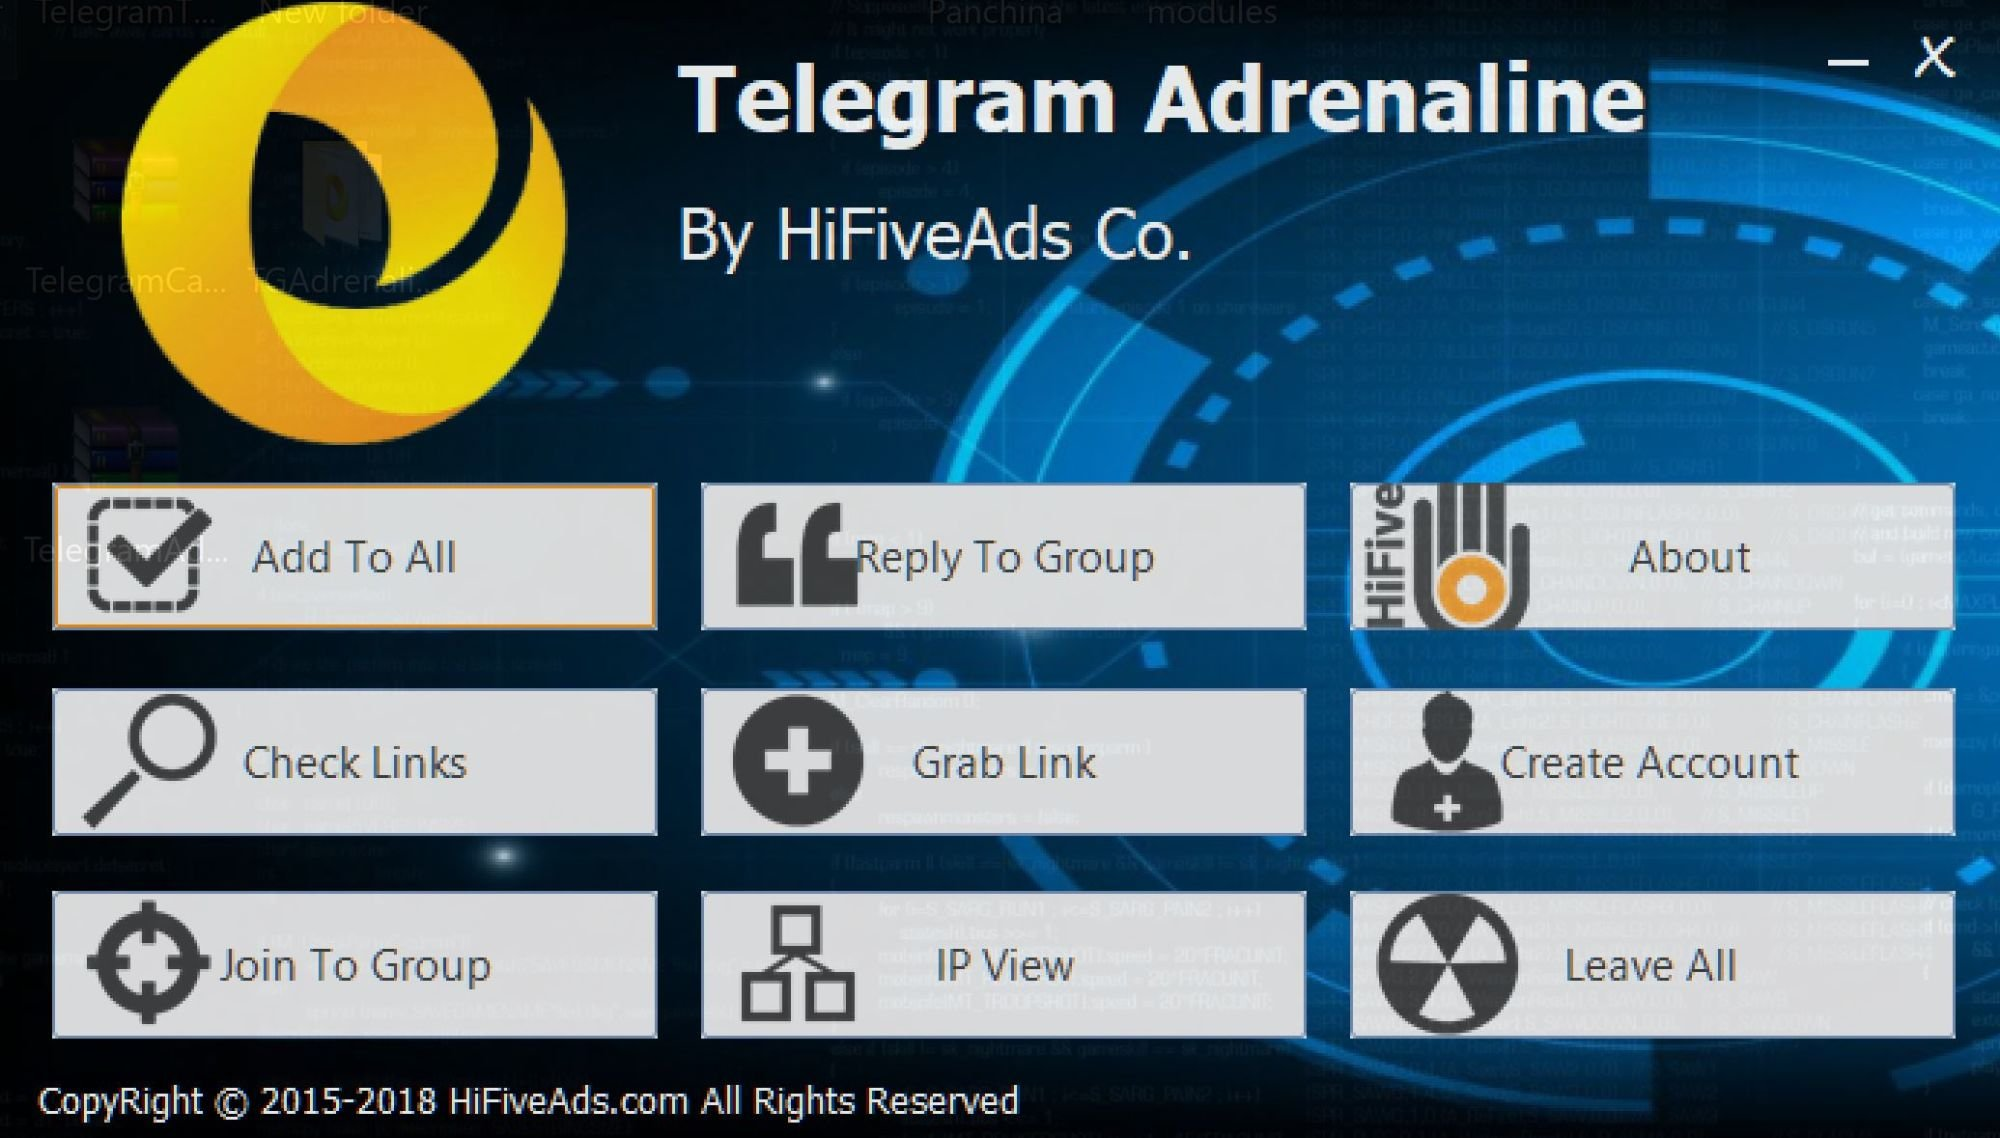 telegram adrenaline